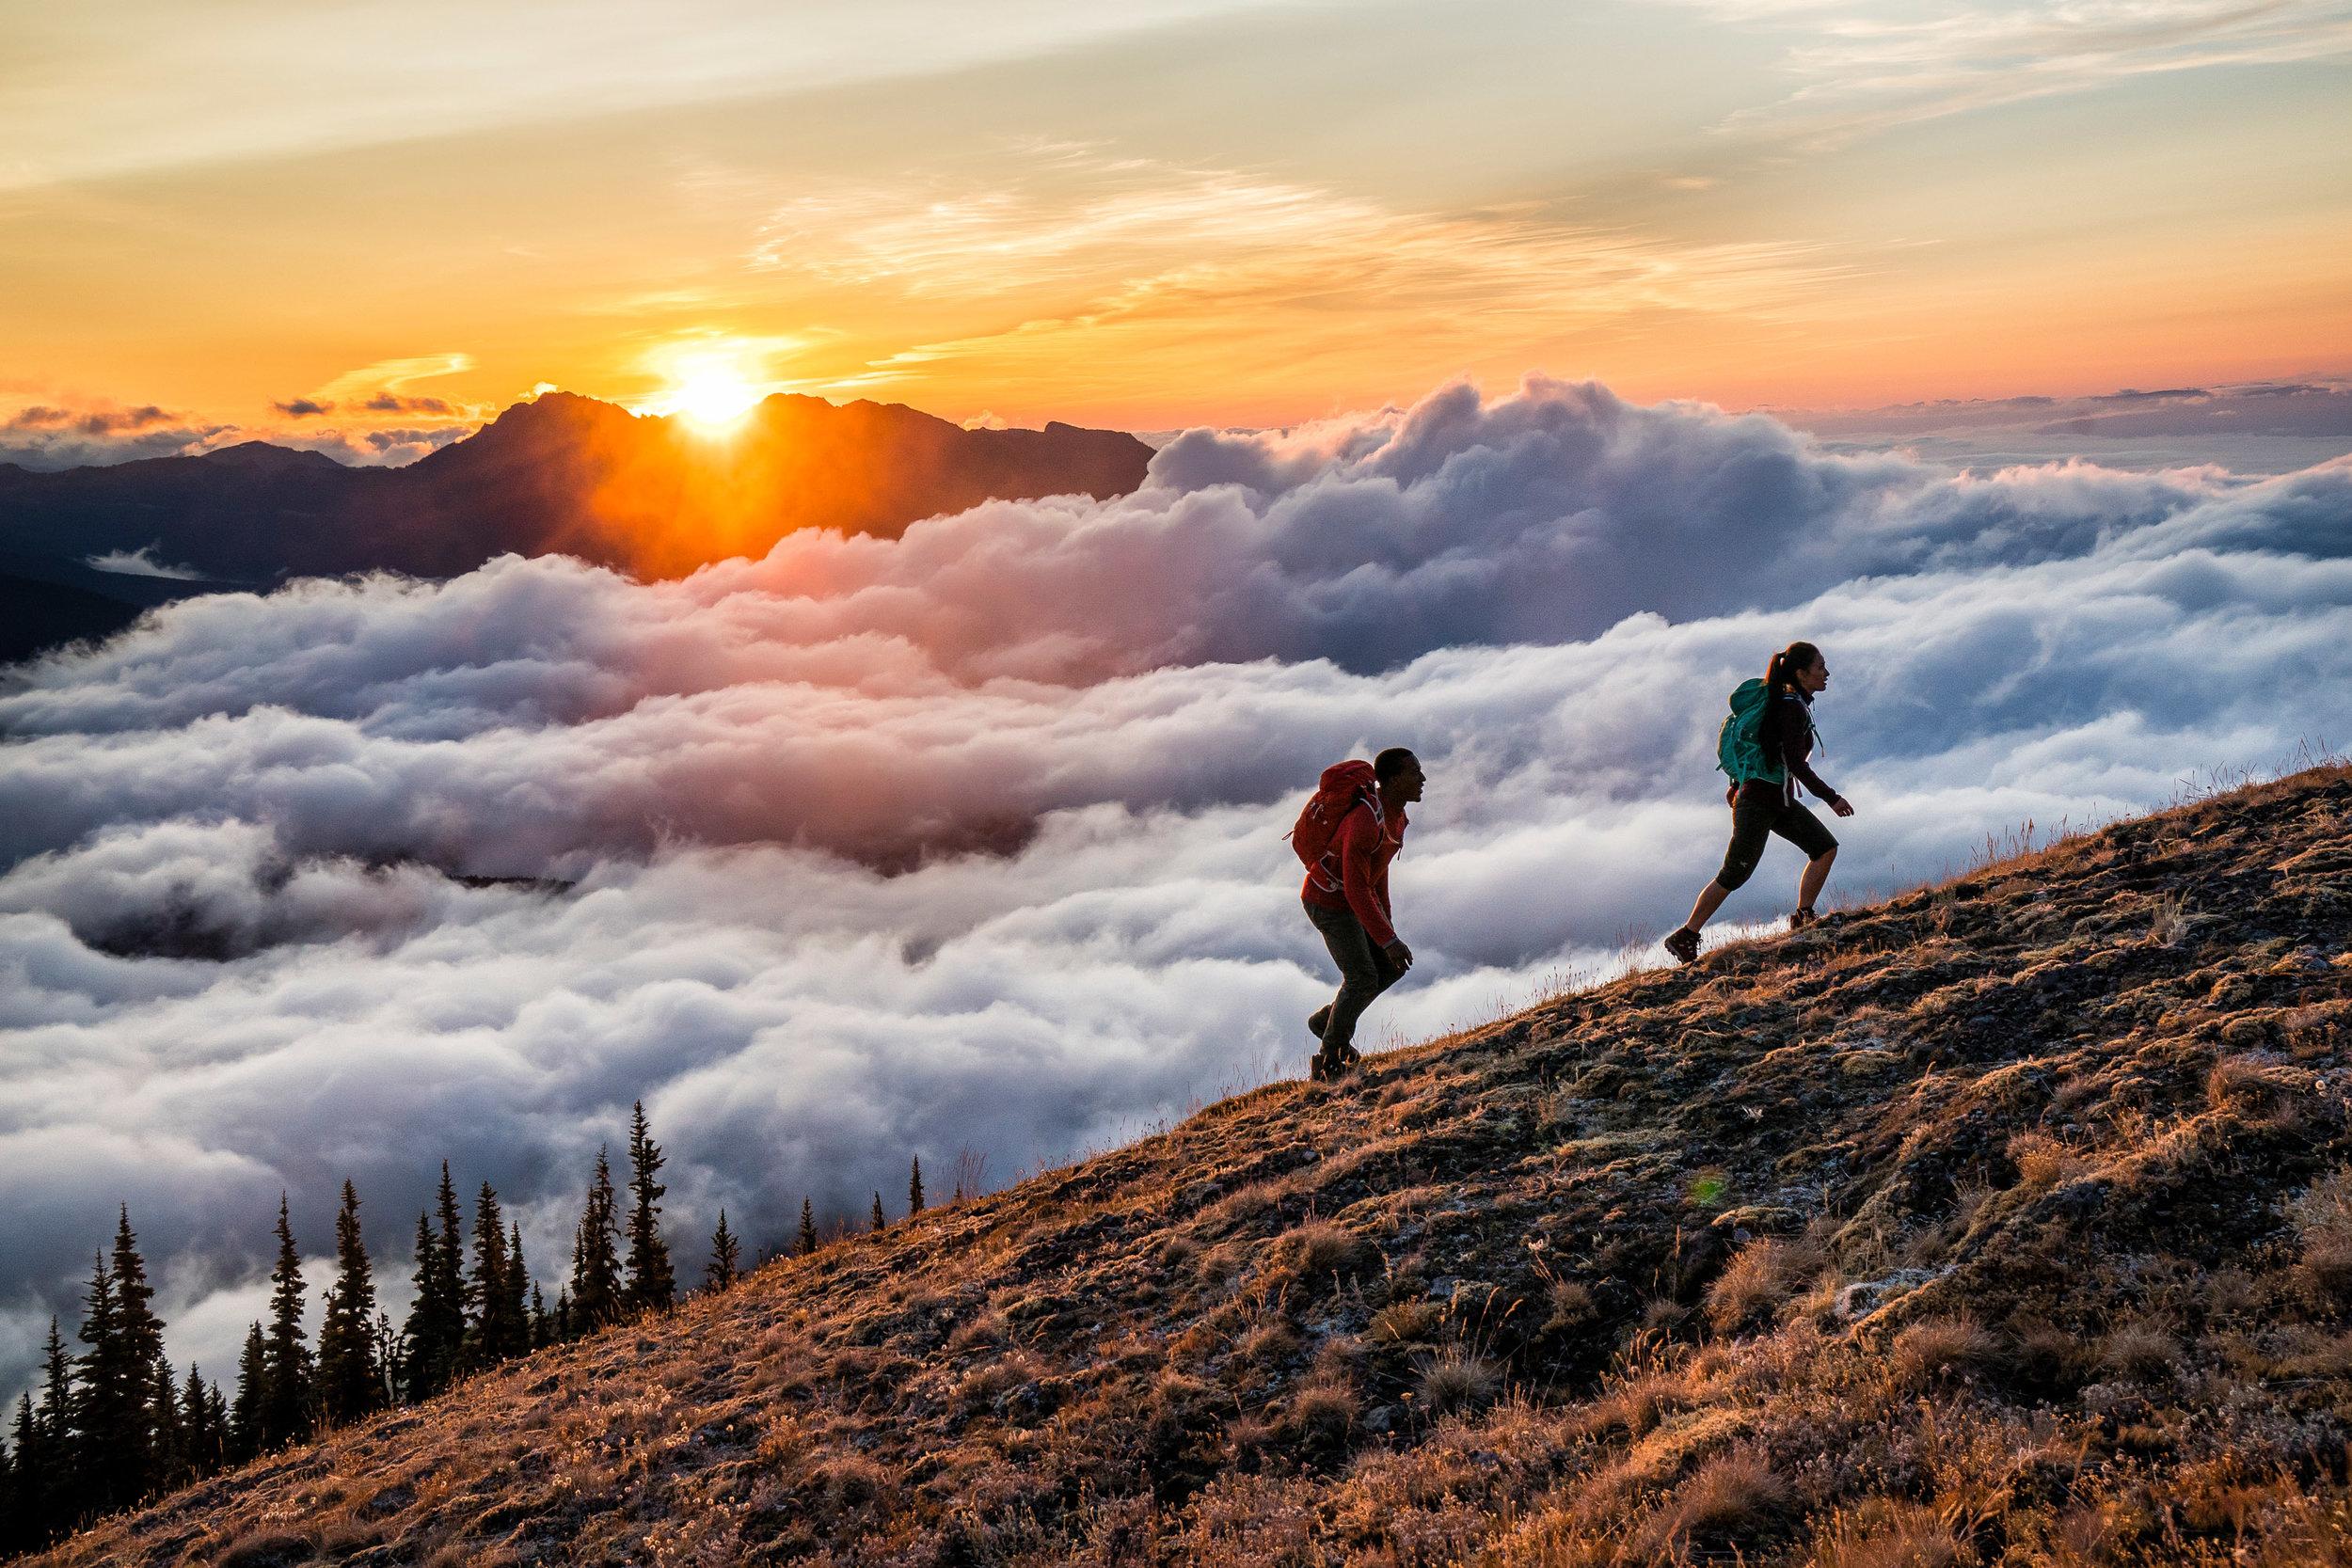 matera adventure hike olympic mountains_DSC4101.jpg